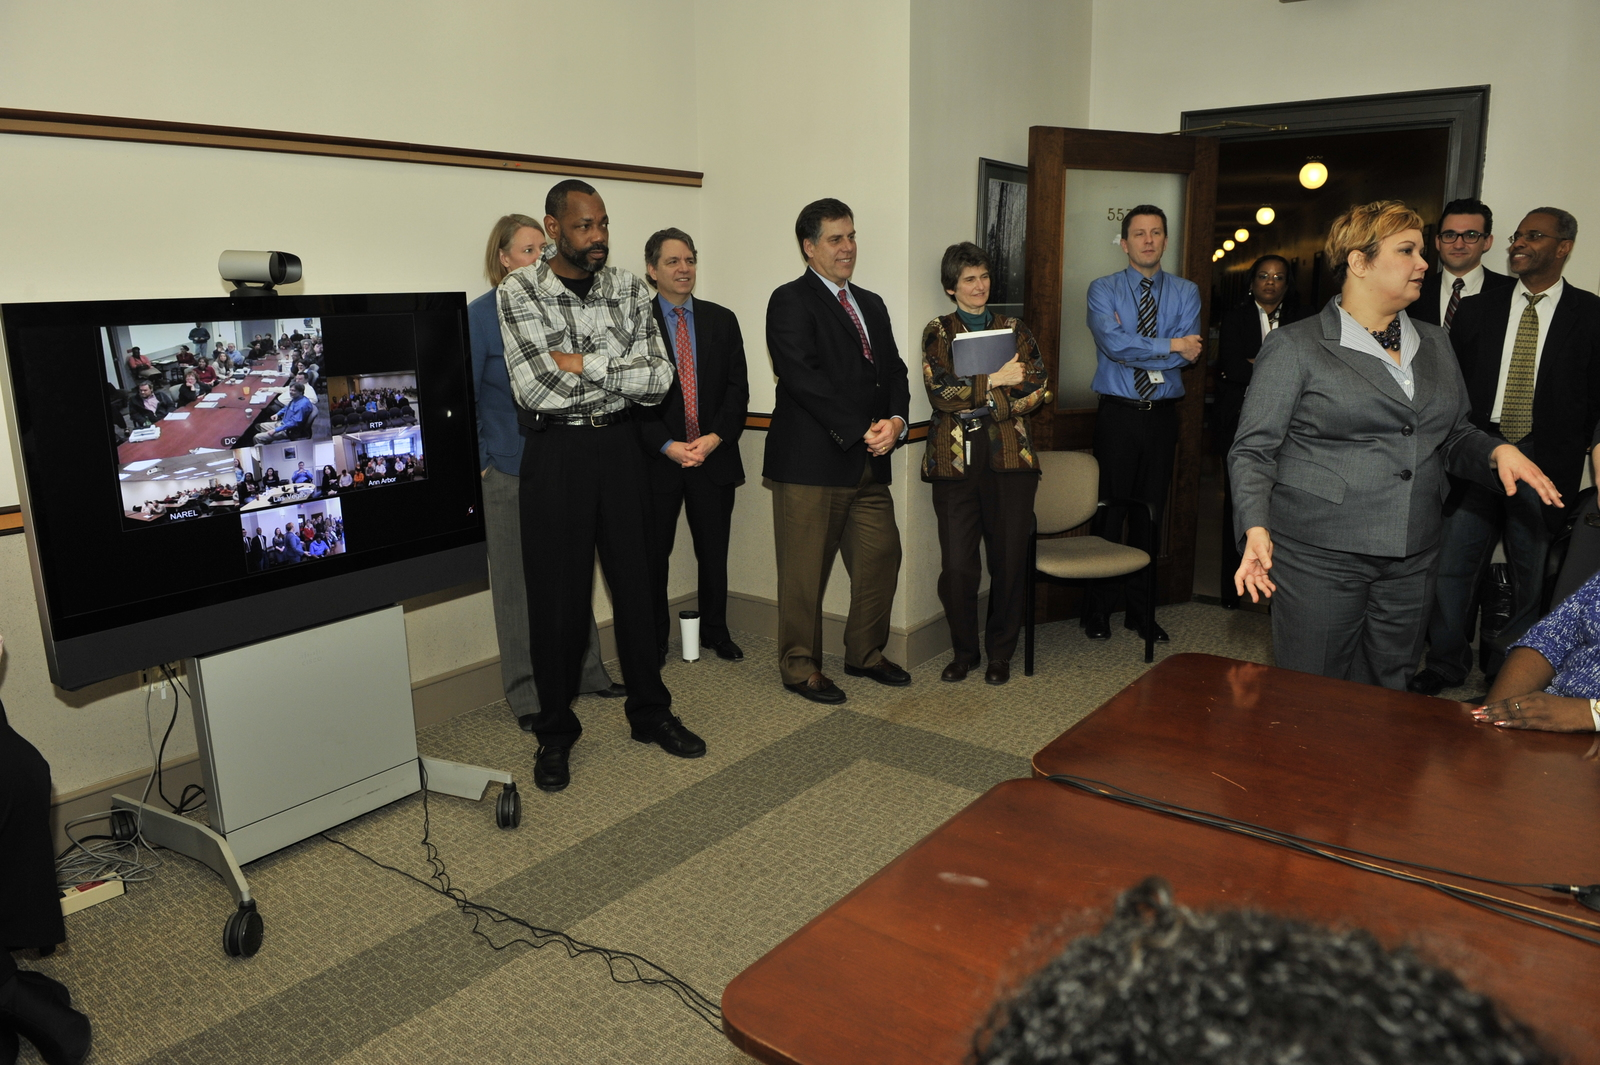 Office of the Administrator - Lisa Jackson's Farewell Tour [412-APD-1115-2013-02-07_FarewellTour_153.JPG]